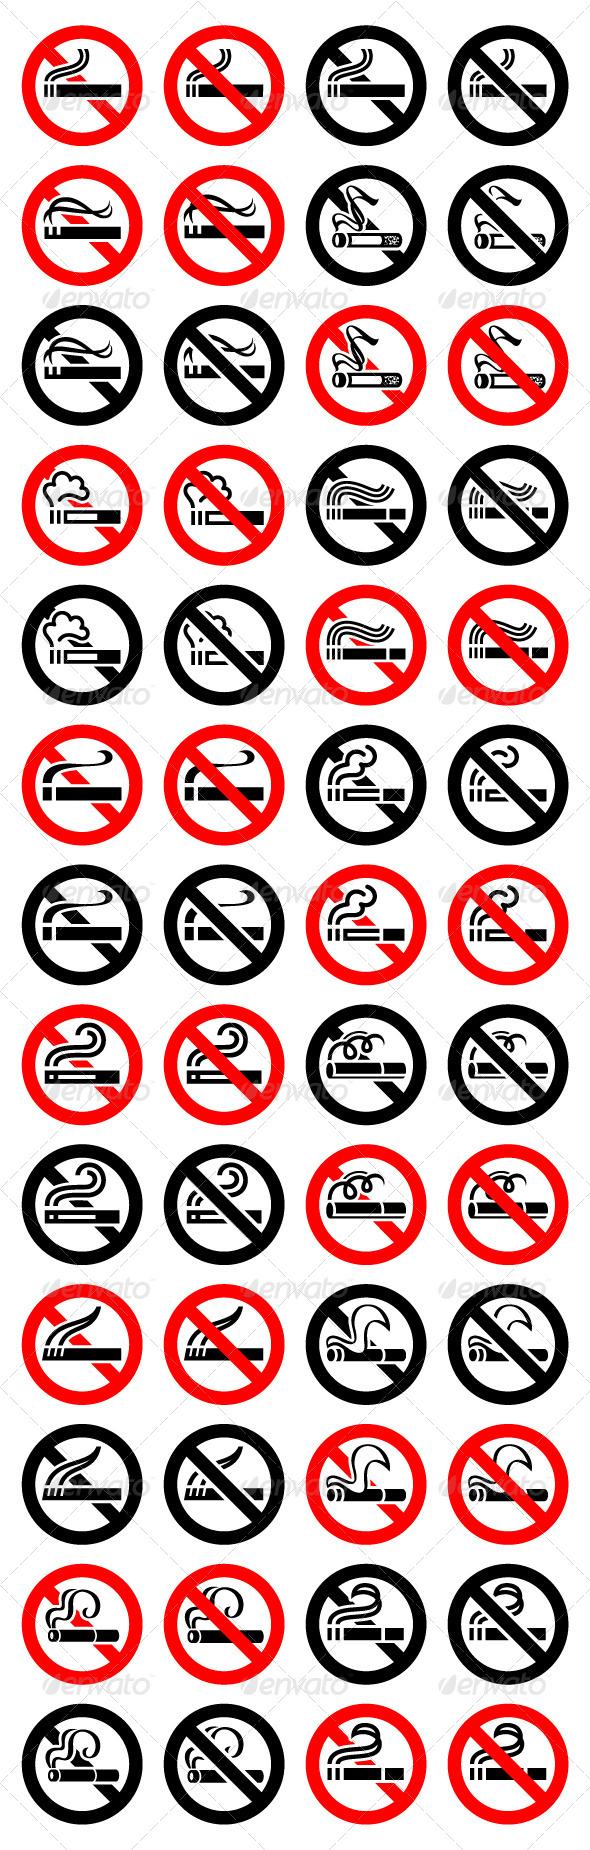 52 Round Signs 13 Cigarette Symbols - Decorative Symbols Decorative